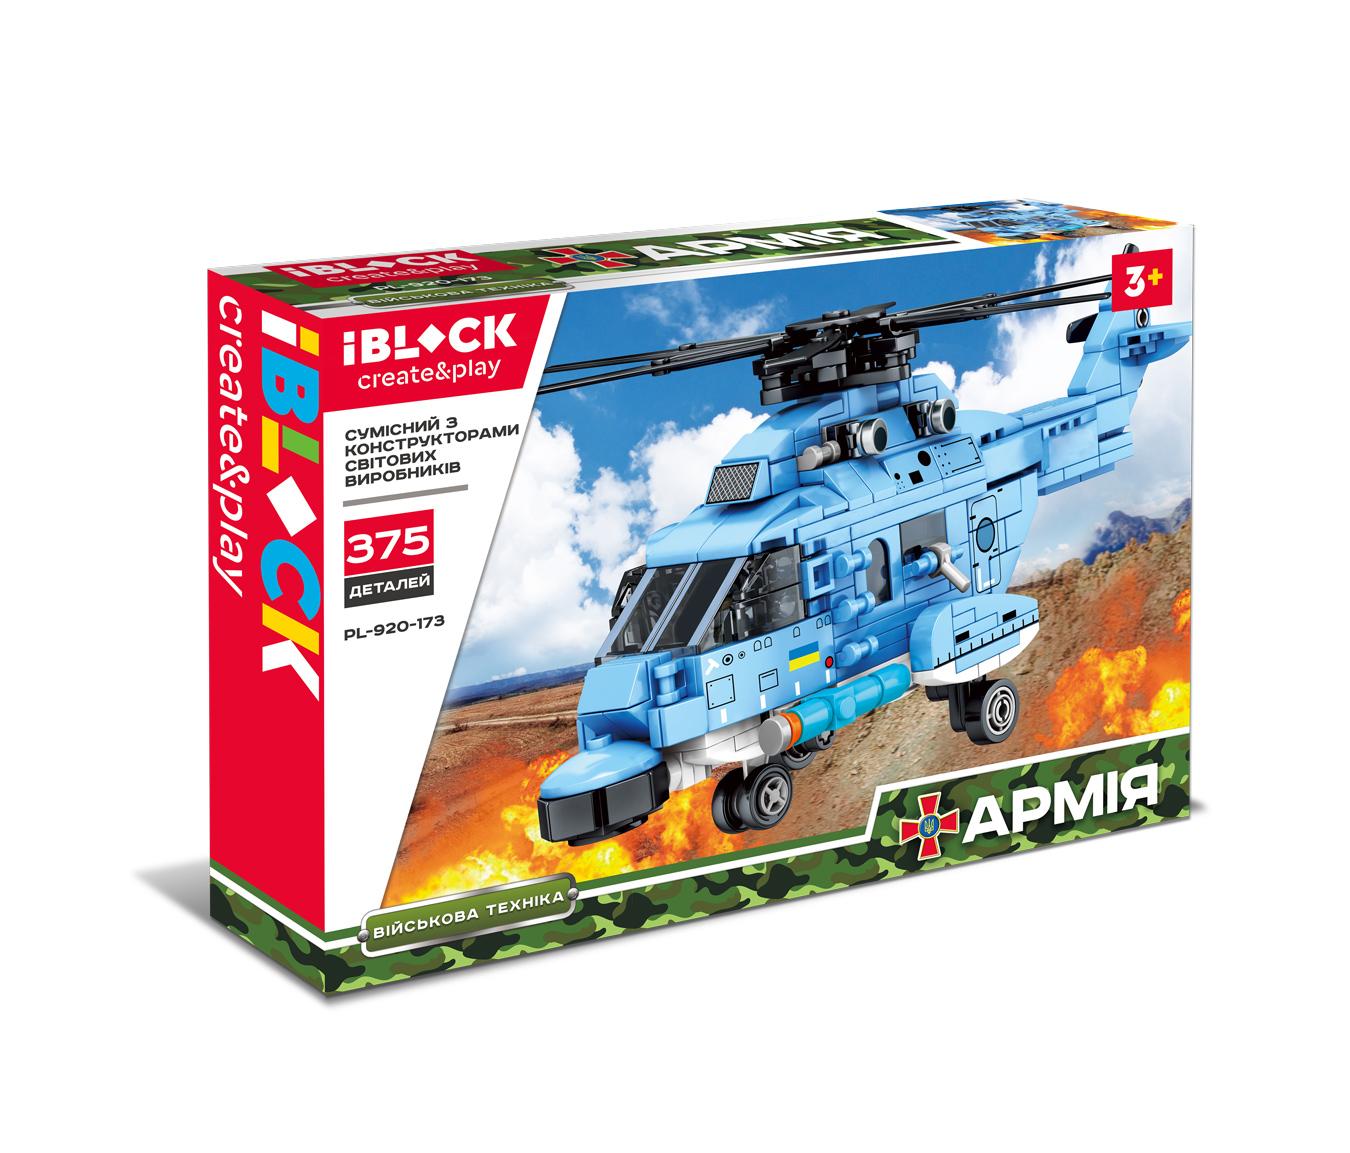 Конструктор IBLOCK Армія PL-920-173